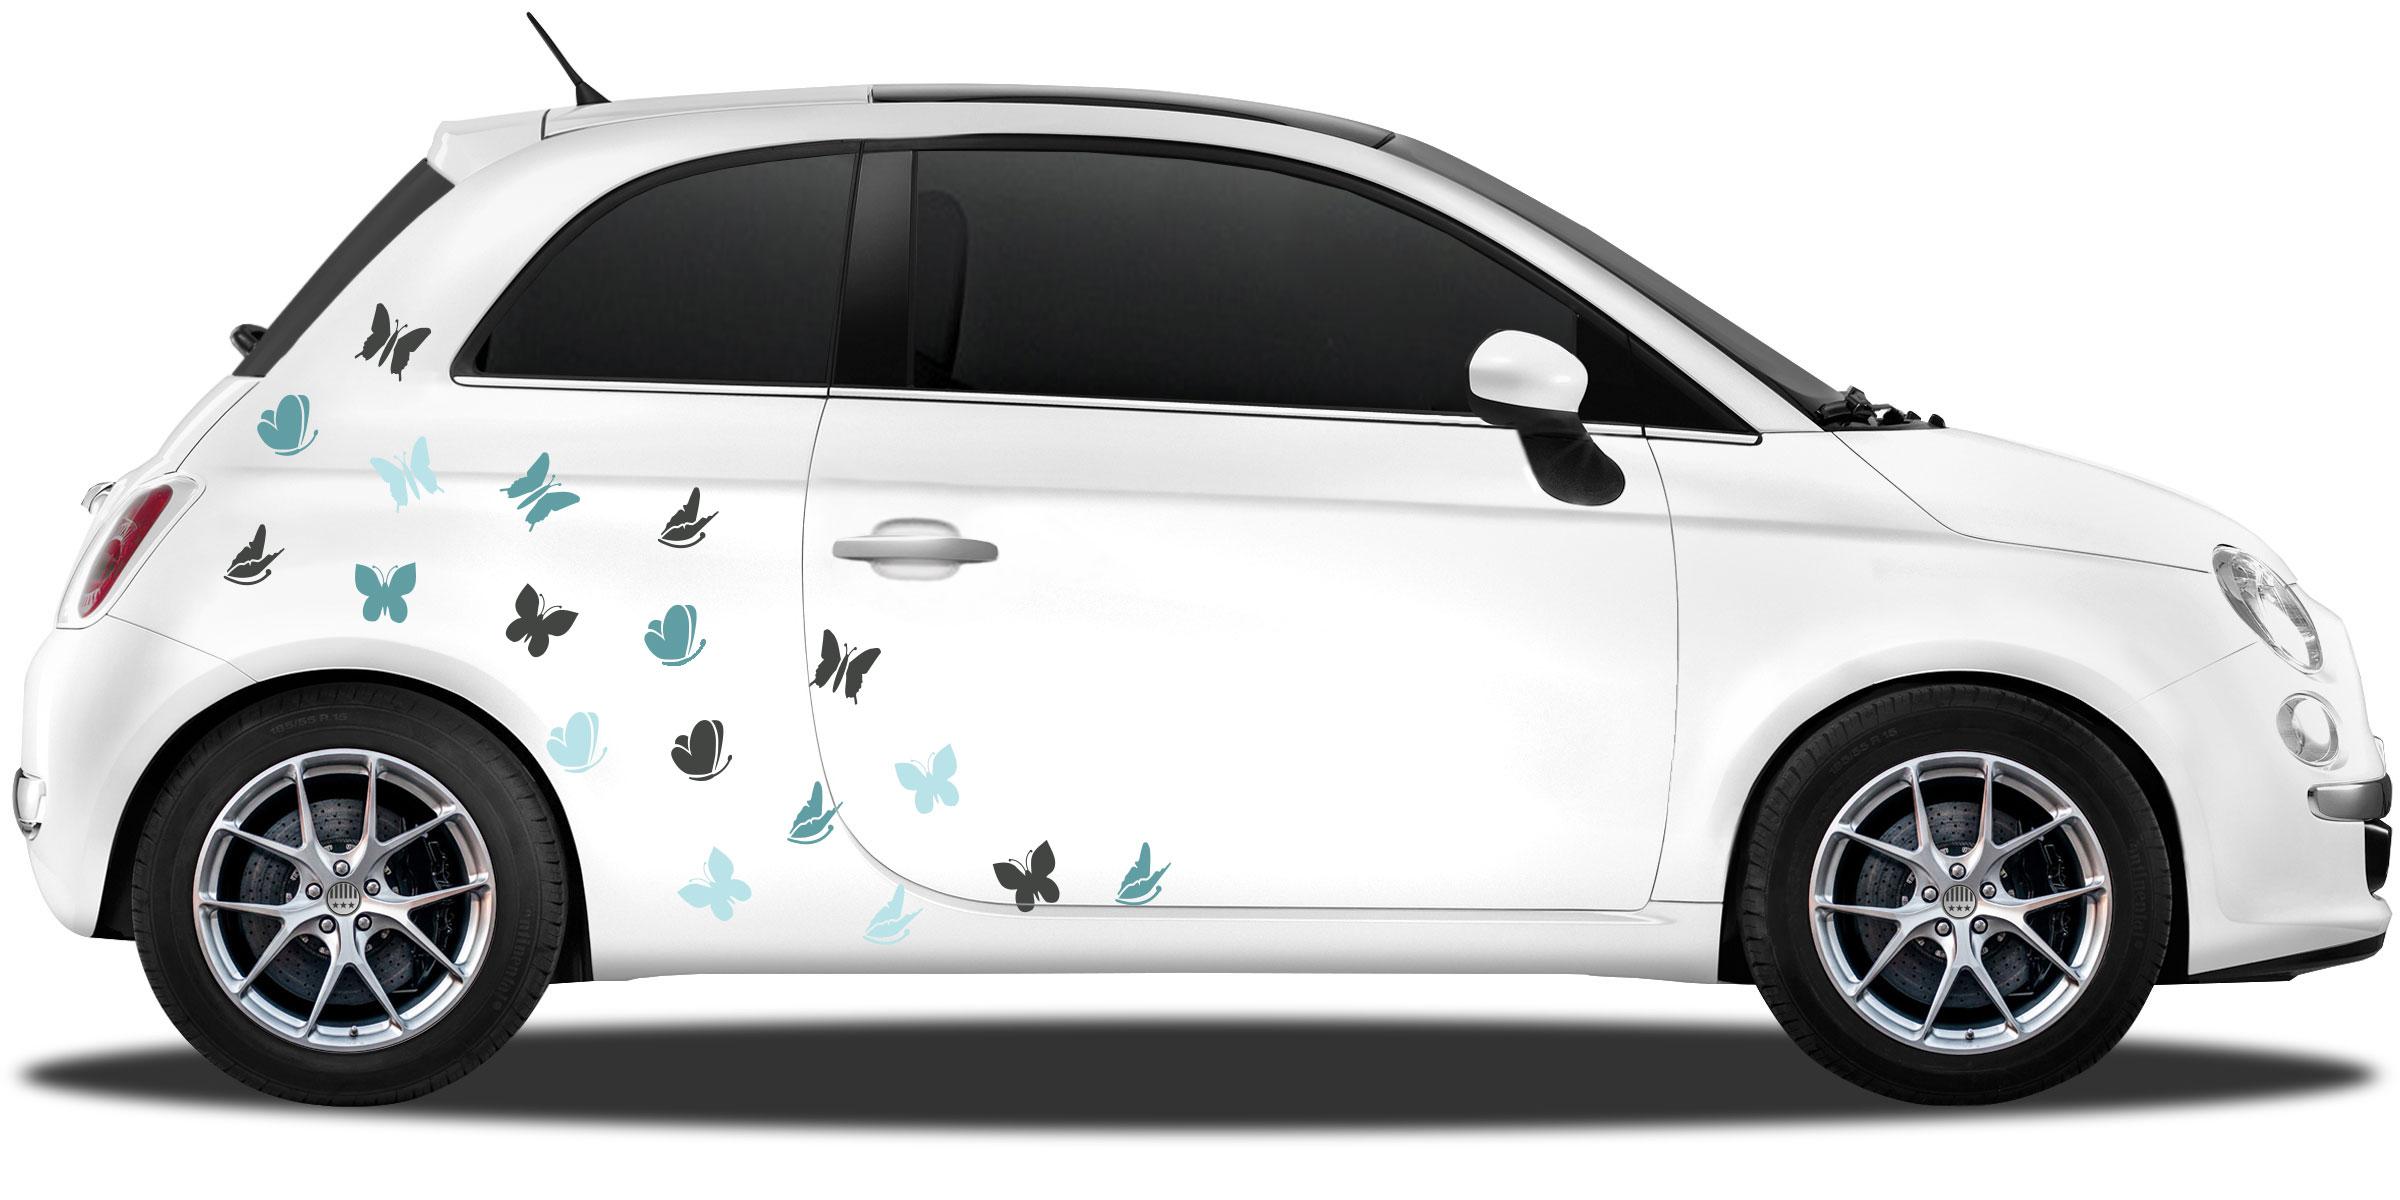 Autoaufkleber Bunte Schmetterlinge Tolles Autodekor